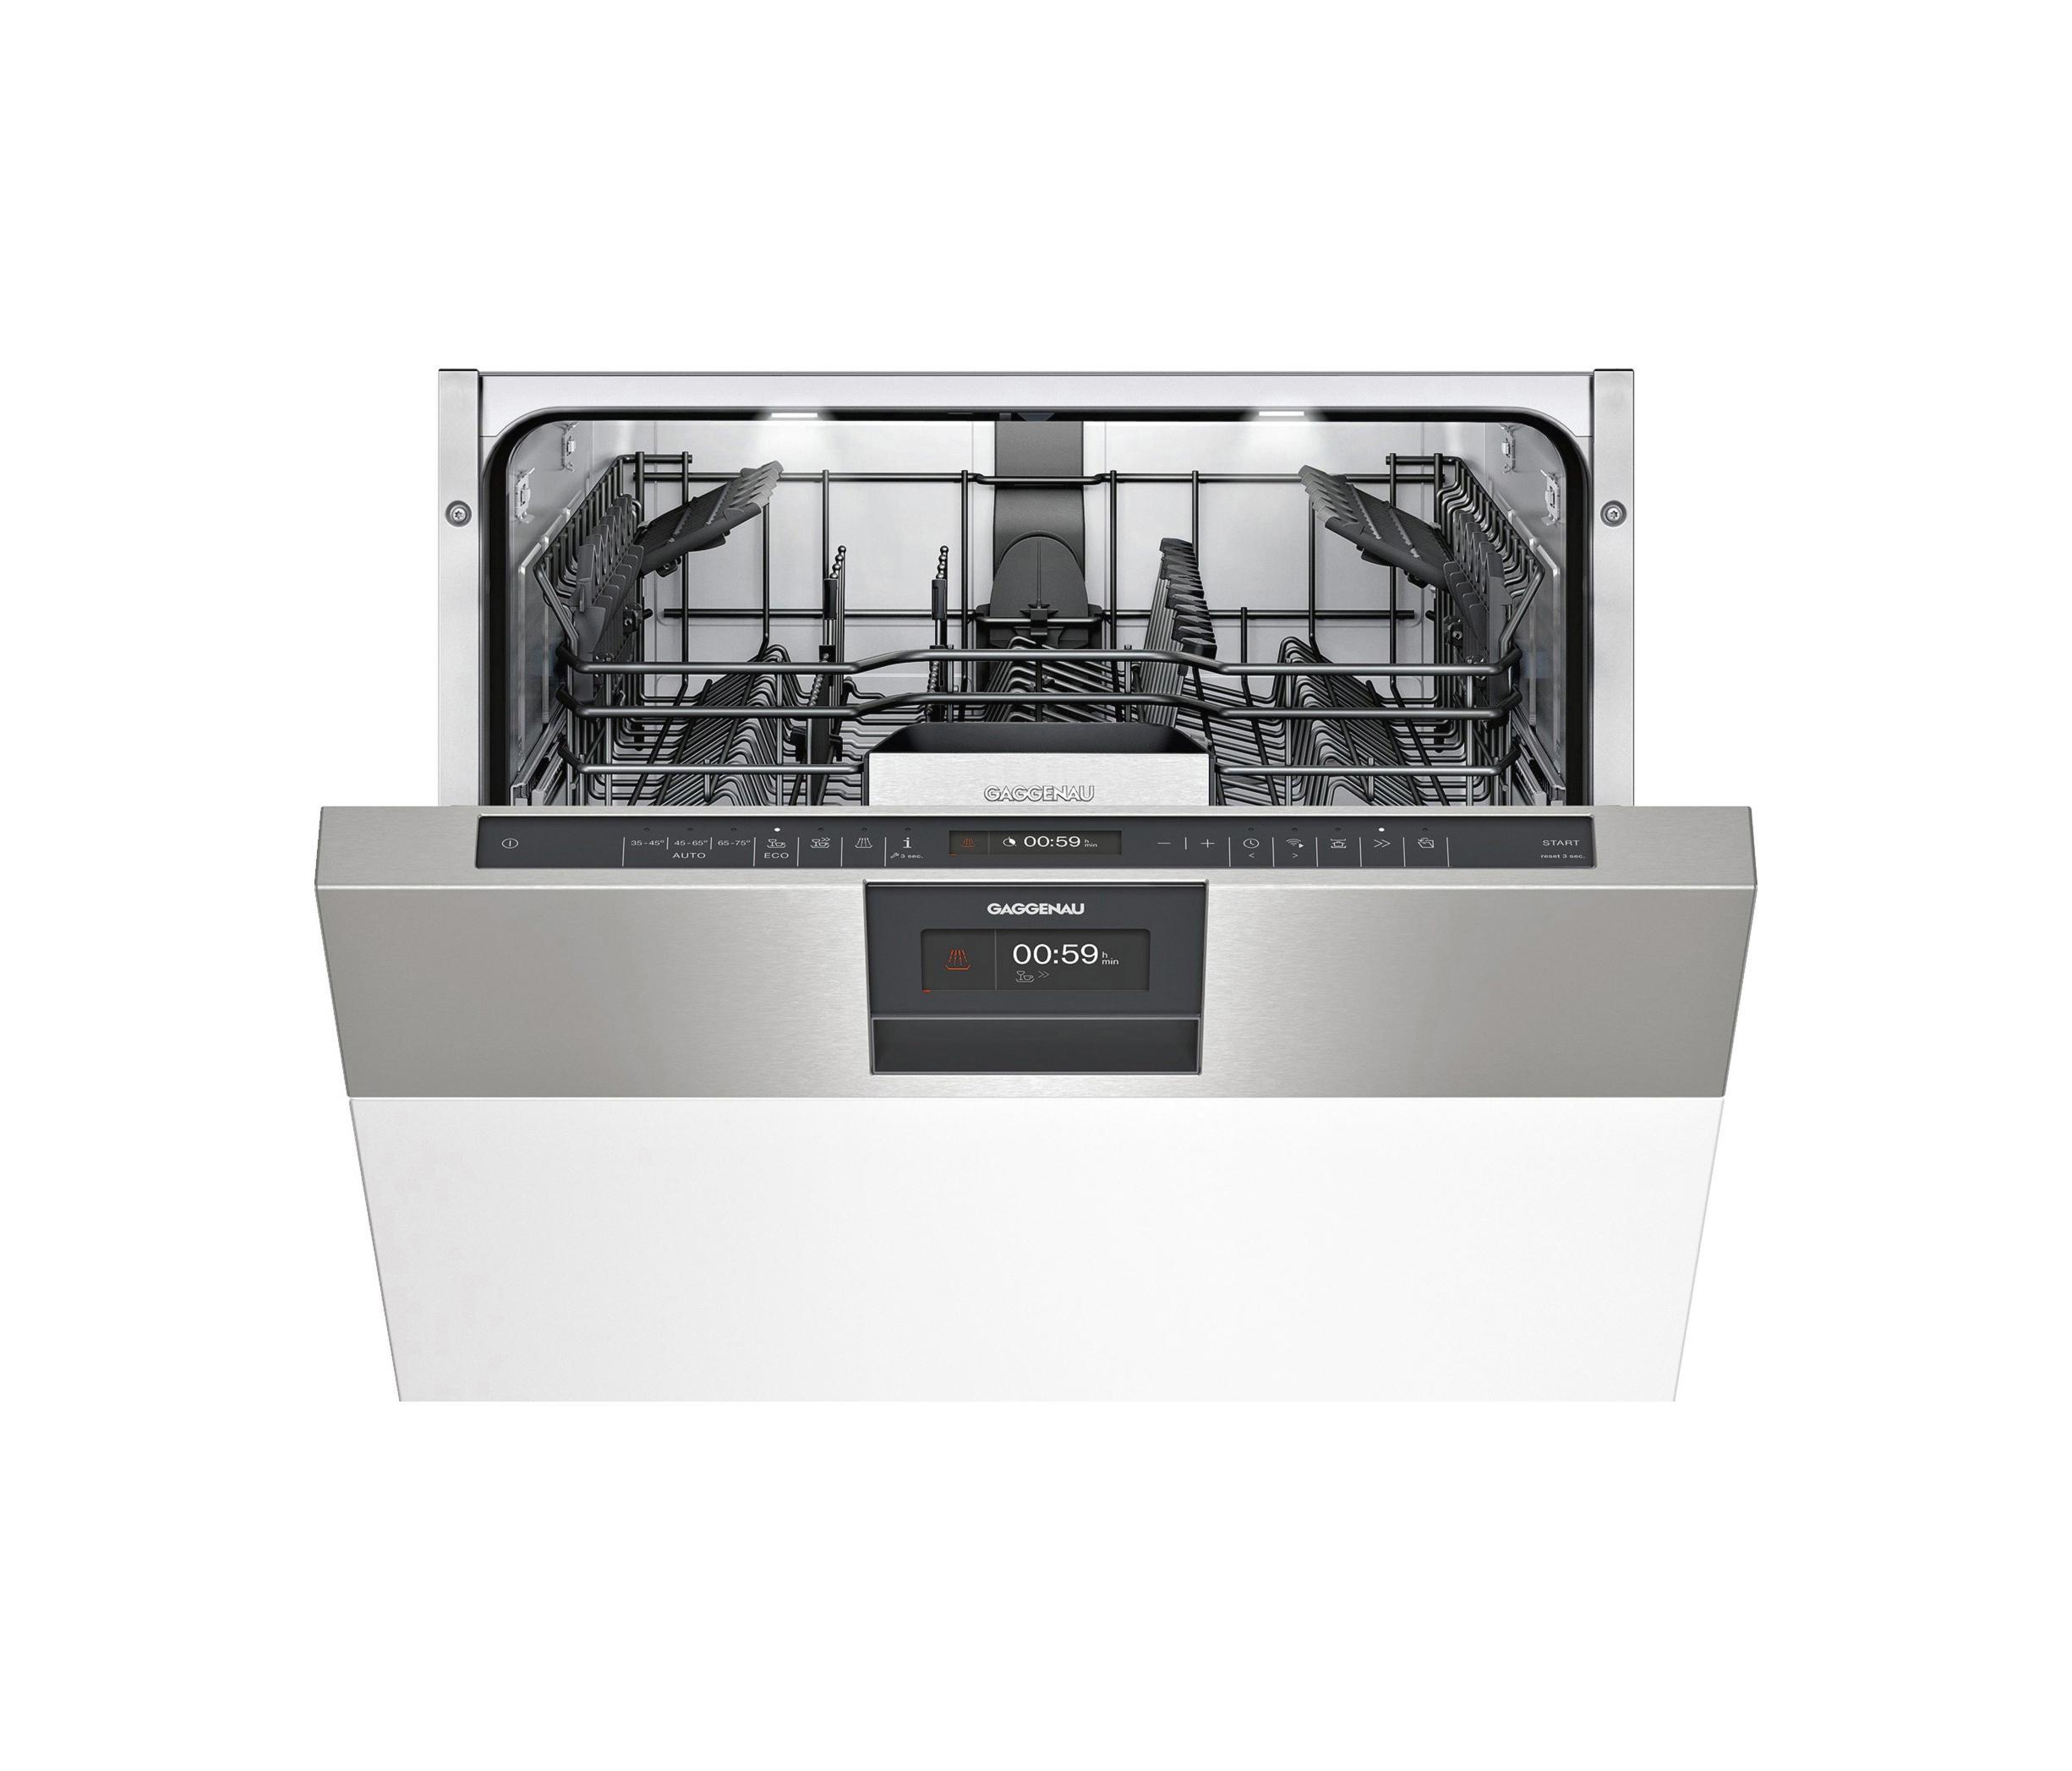 dishwashers 200 series di 261 260 dishwashers from. Black Bedroom Furniture Sets. Home Design Ideas